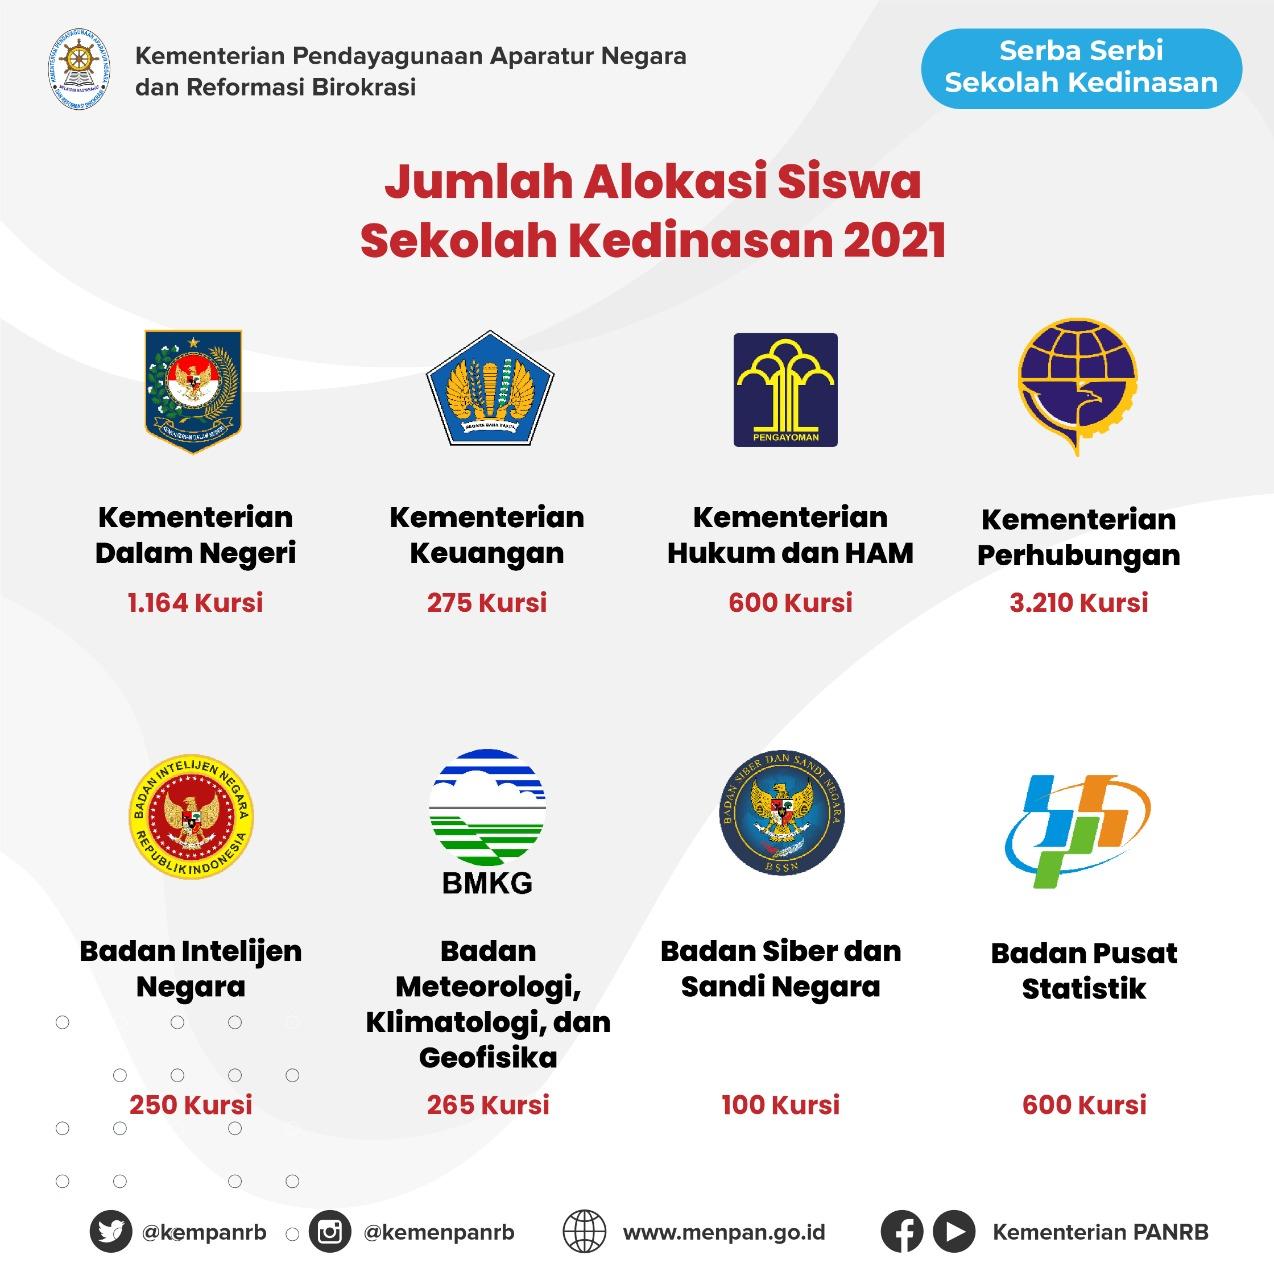 JADWAL DAN PERSYARATAN PENDAFTARAN SEKOLAH KEDINASAN TAHUN 2021 TAHUN AKADEMIK 2021/2022